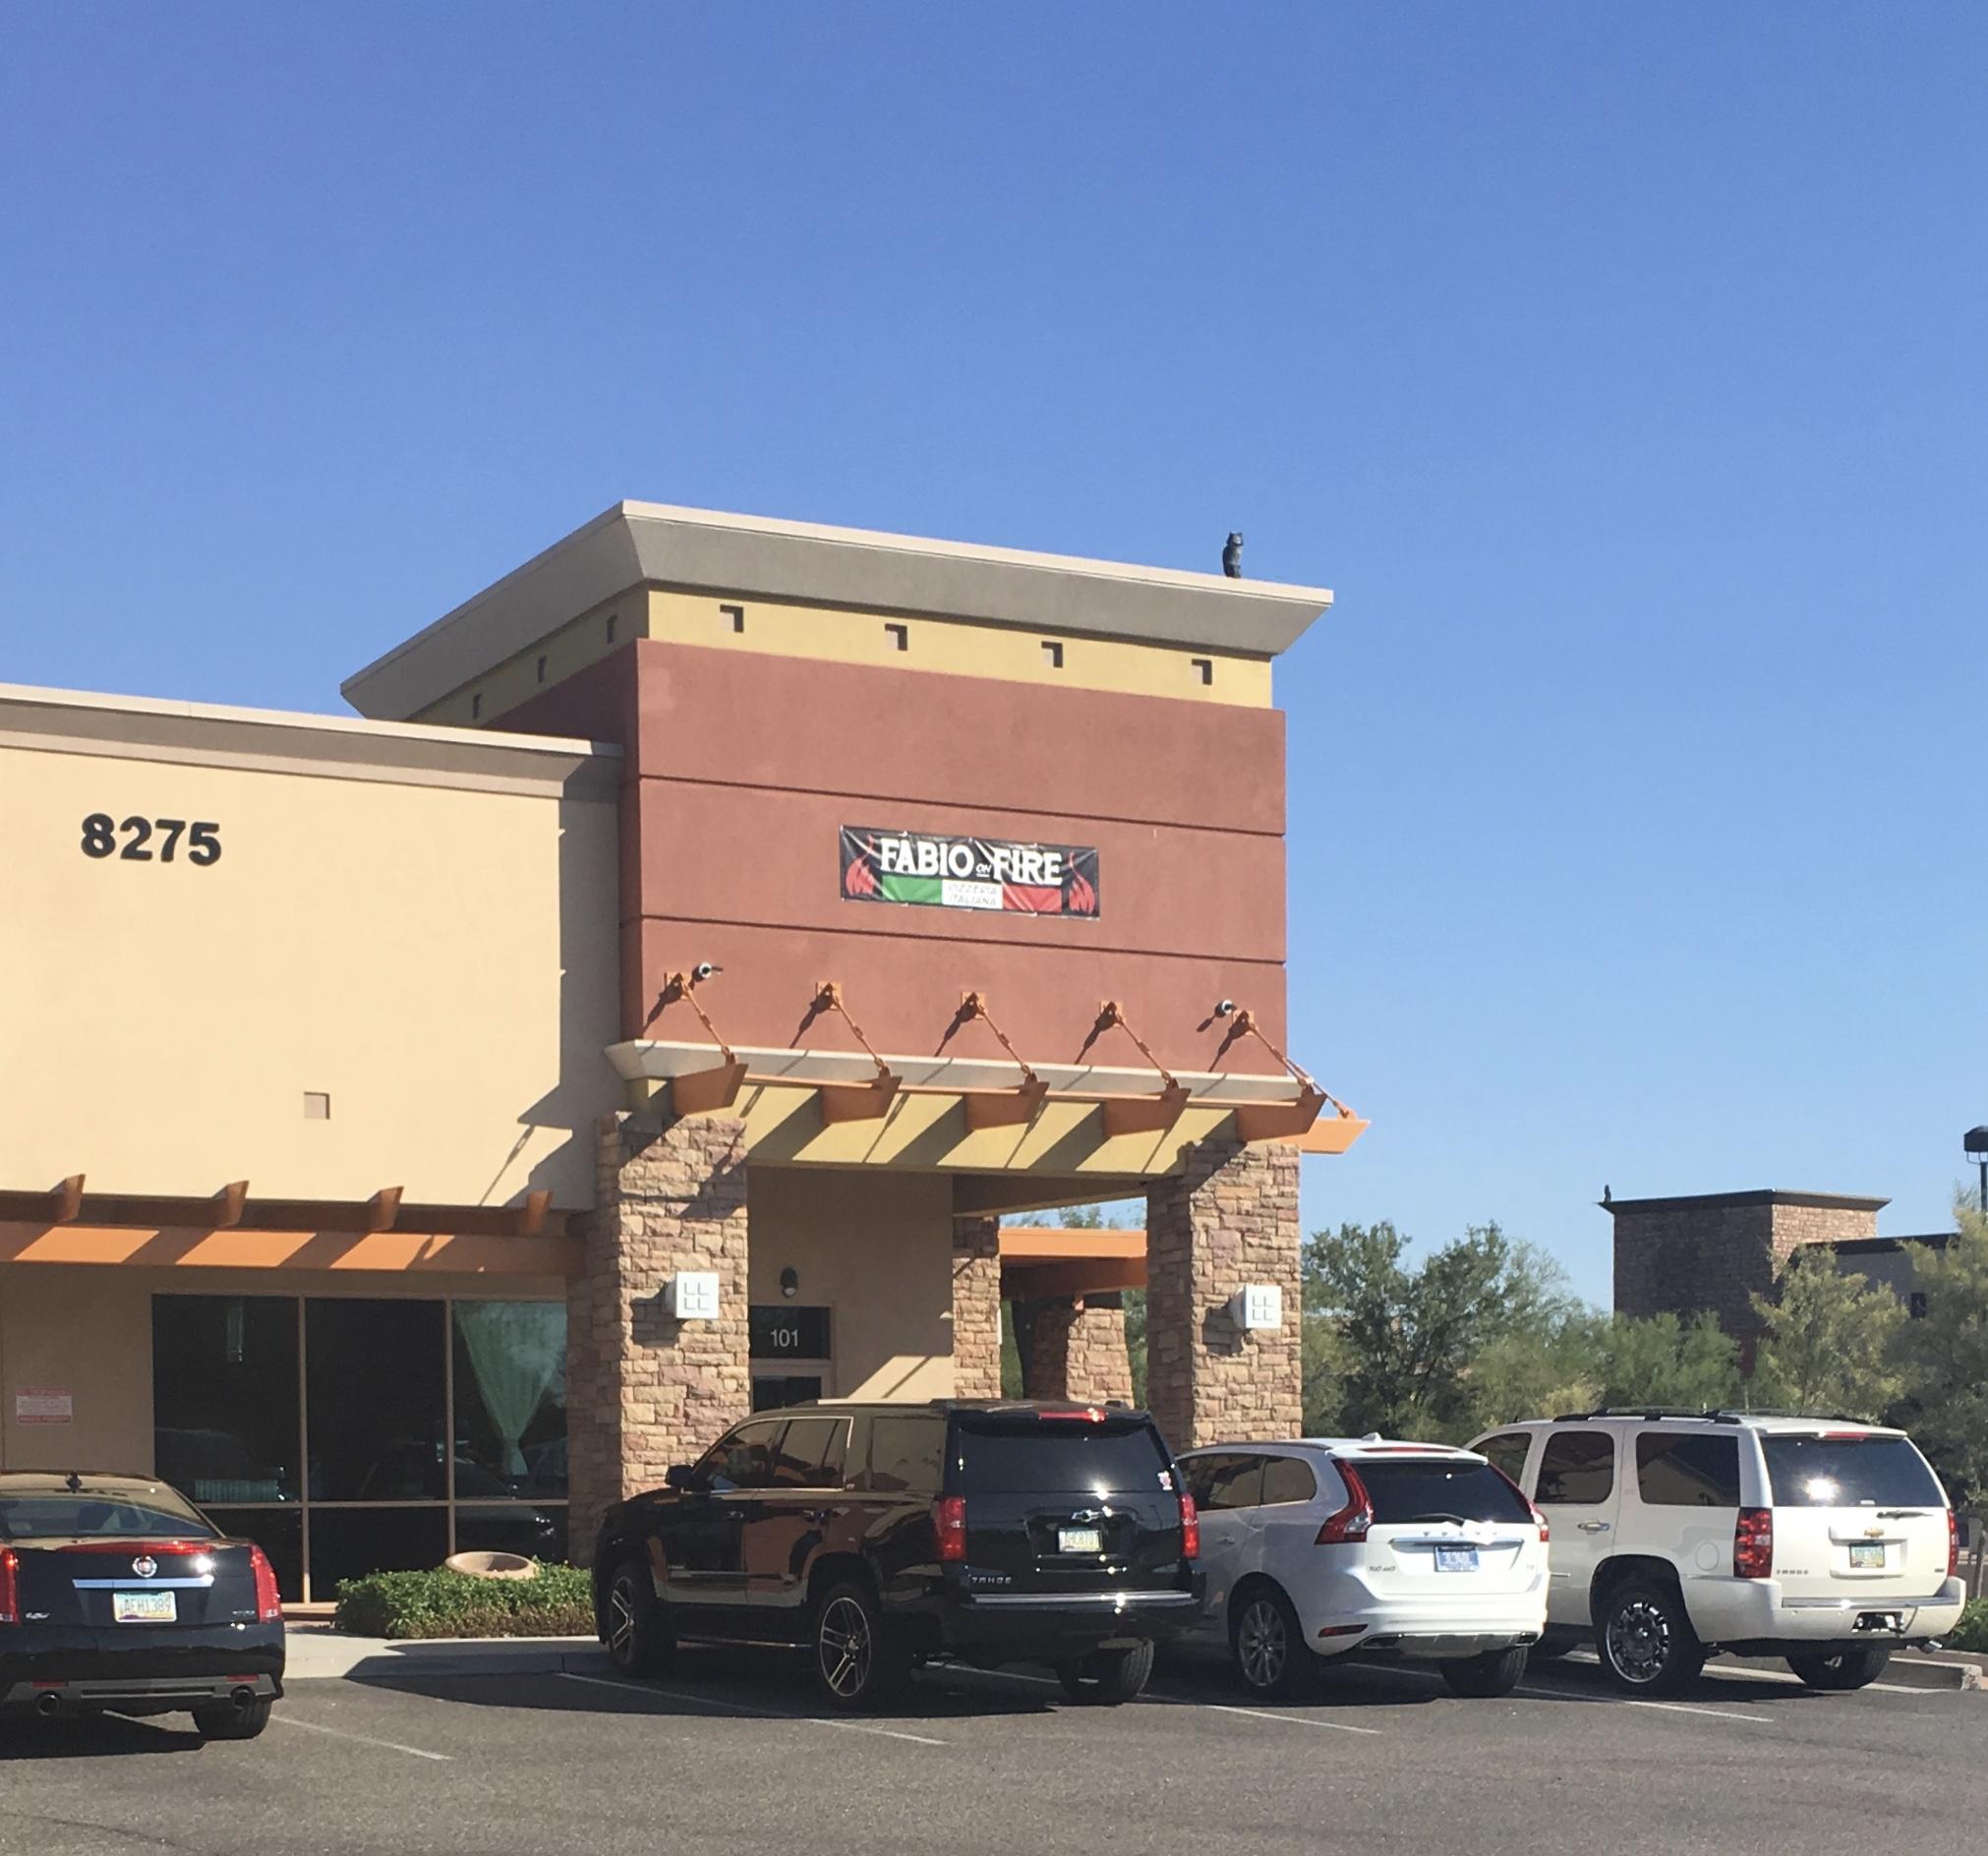 Italian Restaurant In Peoria: Fabio On Fire Restaurant In Peoria AZ Is Worth A FORK